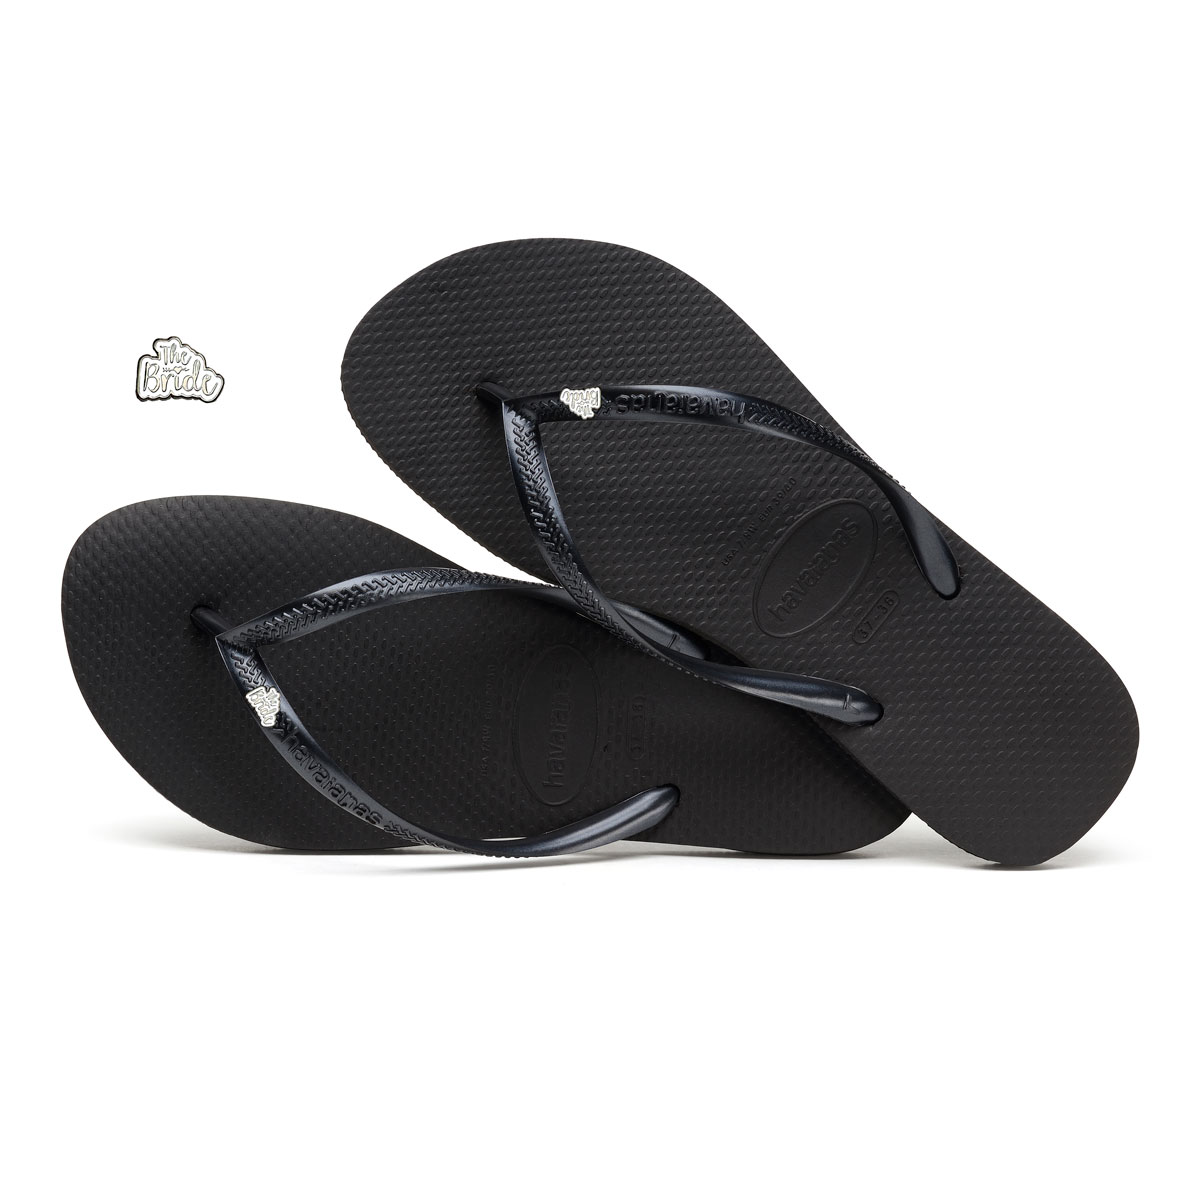 Havaianas Slim Black Flip-Flops with Silver 'The Bride' Charm Wedding